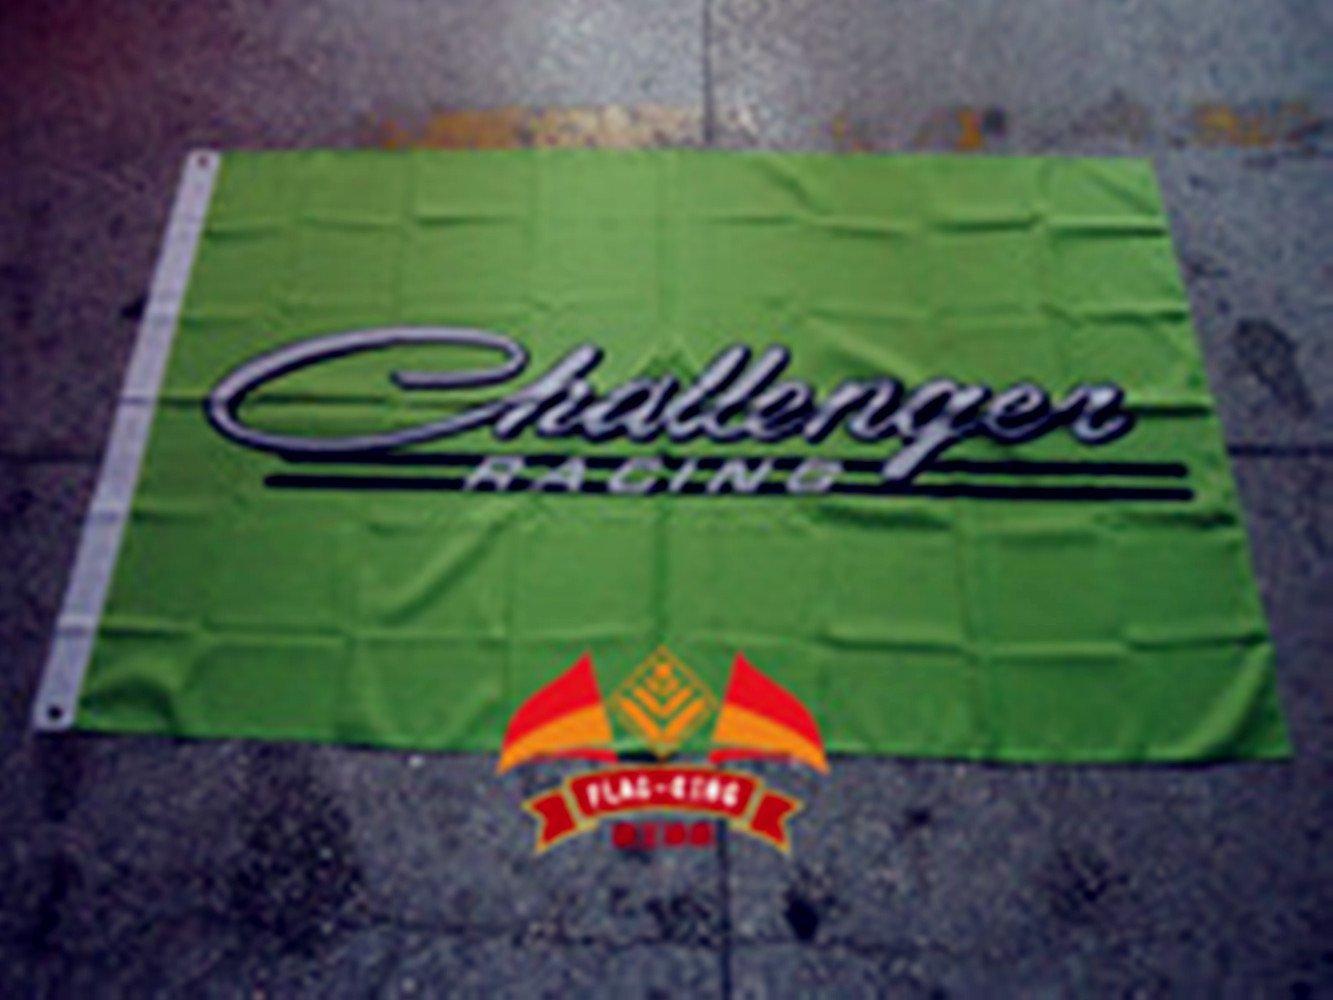 green challenger flag challenger racing flag challenger car banner Dodge challenger flag Dodge challenger banner--polyster flags,Brass Grommets,Anti-UV,Digital Printing--car flags 3 X 5 Ft